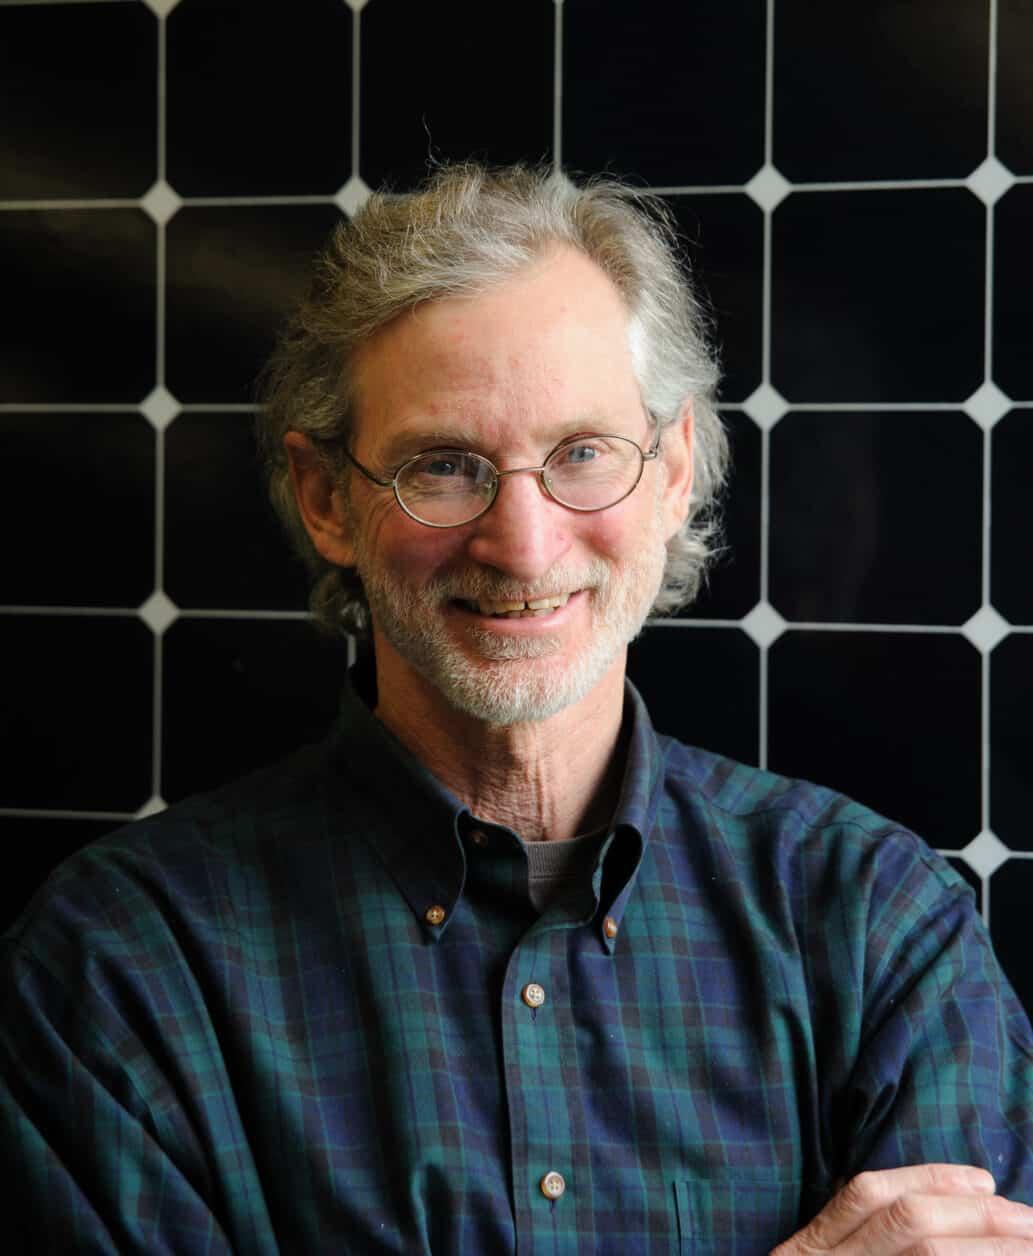 Dan Costin, Assistant Professor